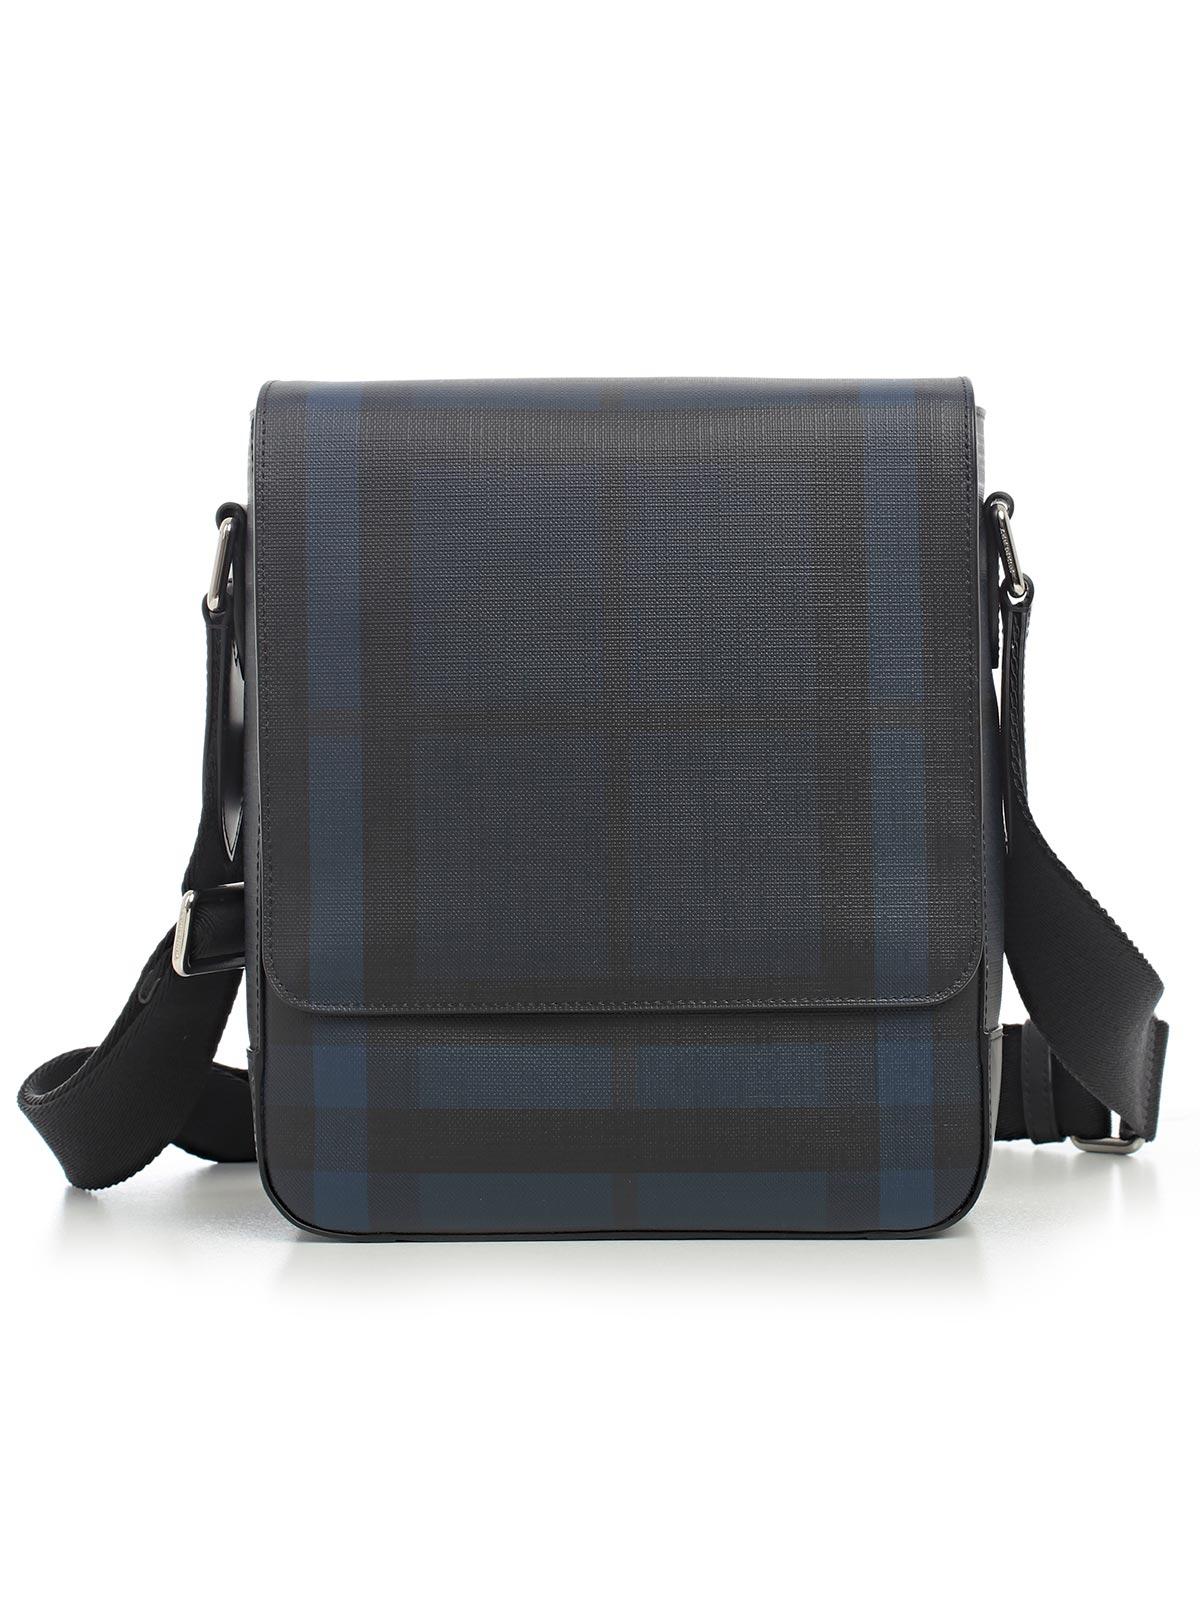 Picture of Burberry Shoulder Bag